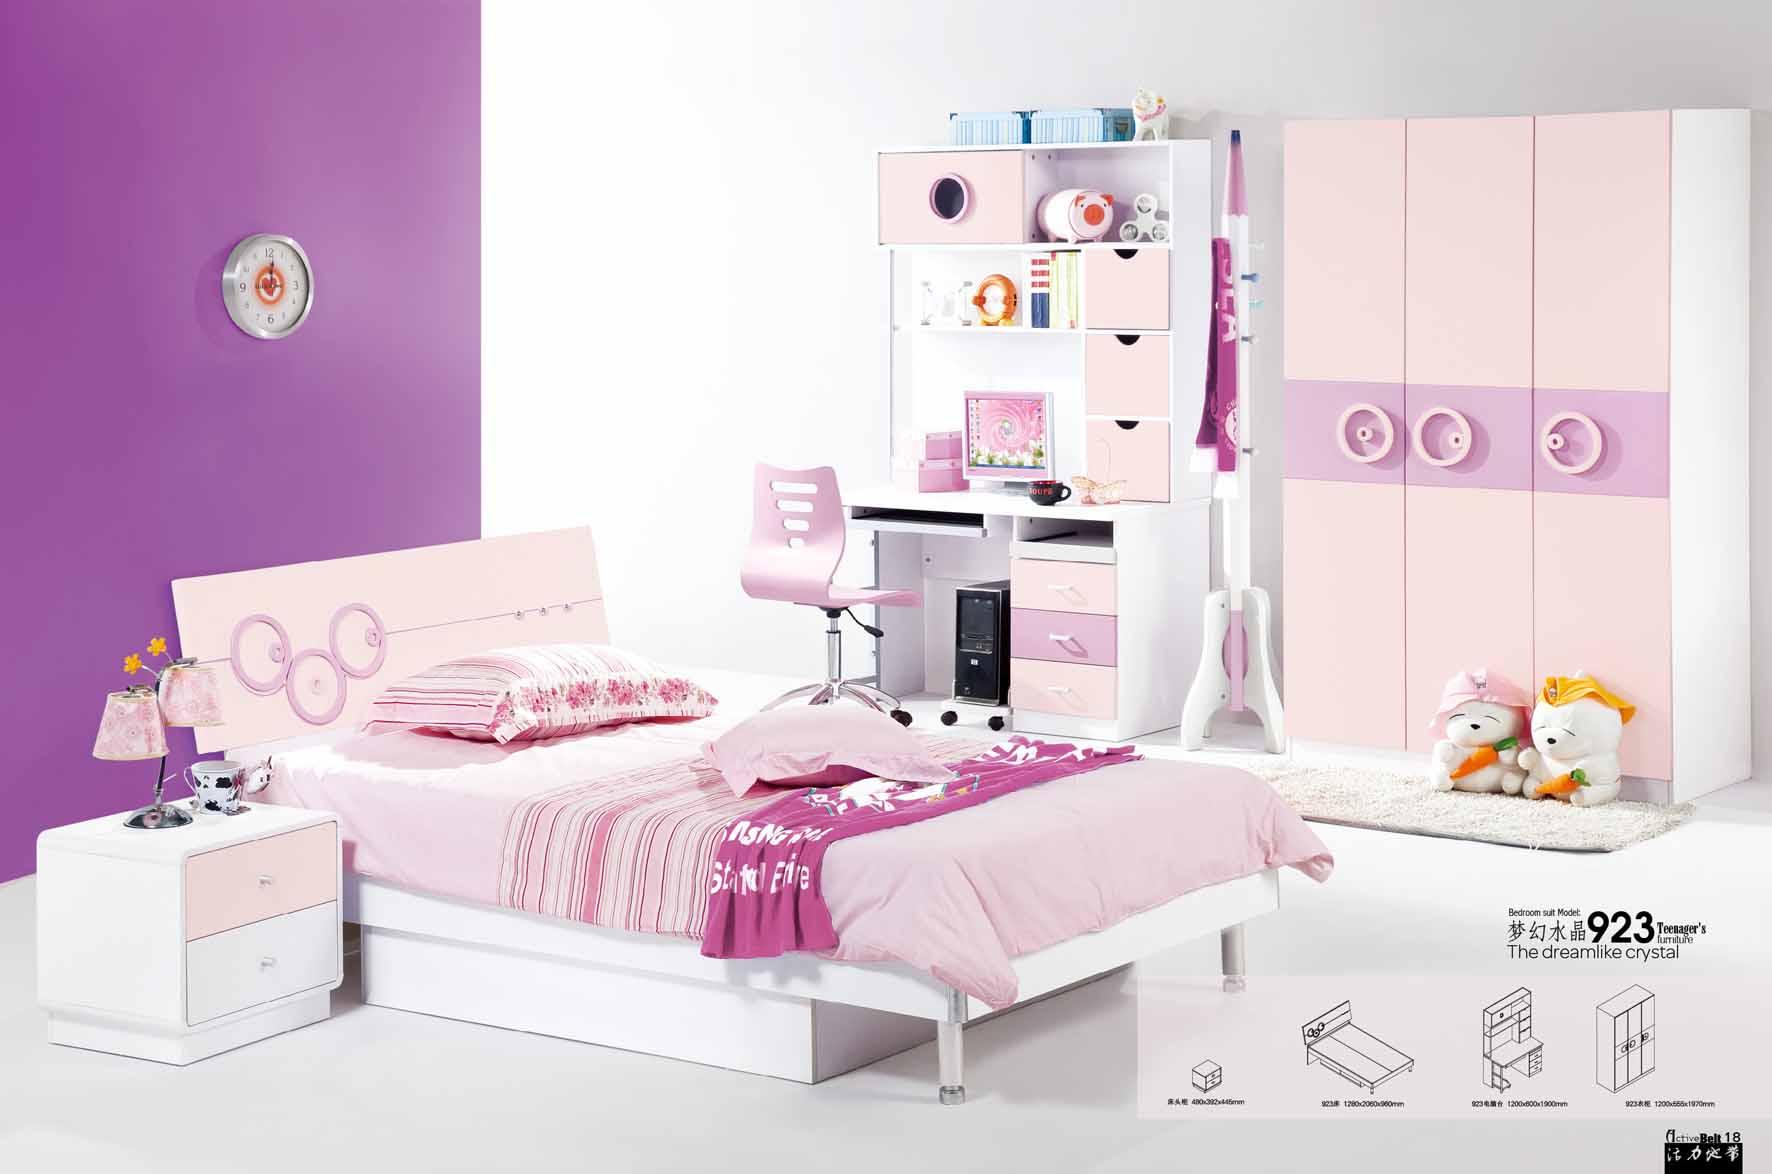 غرف نوم اطفال بنات , اجمل غرف البنات   دلع ورد